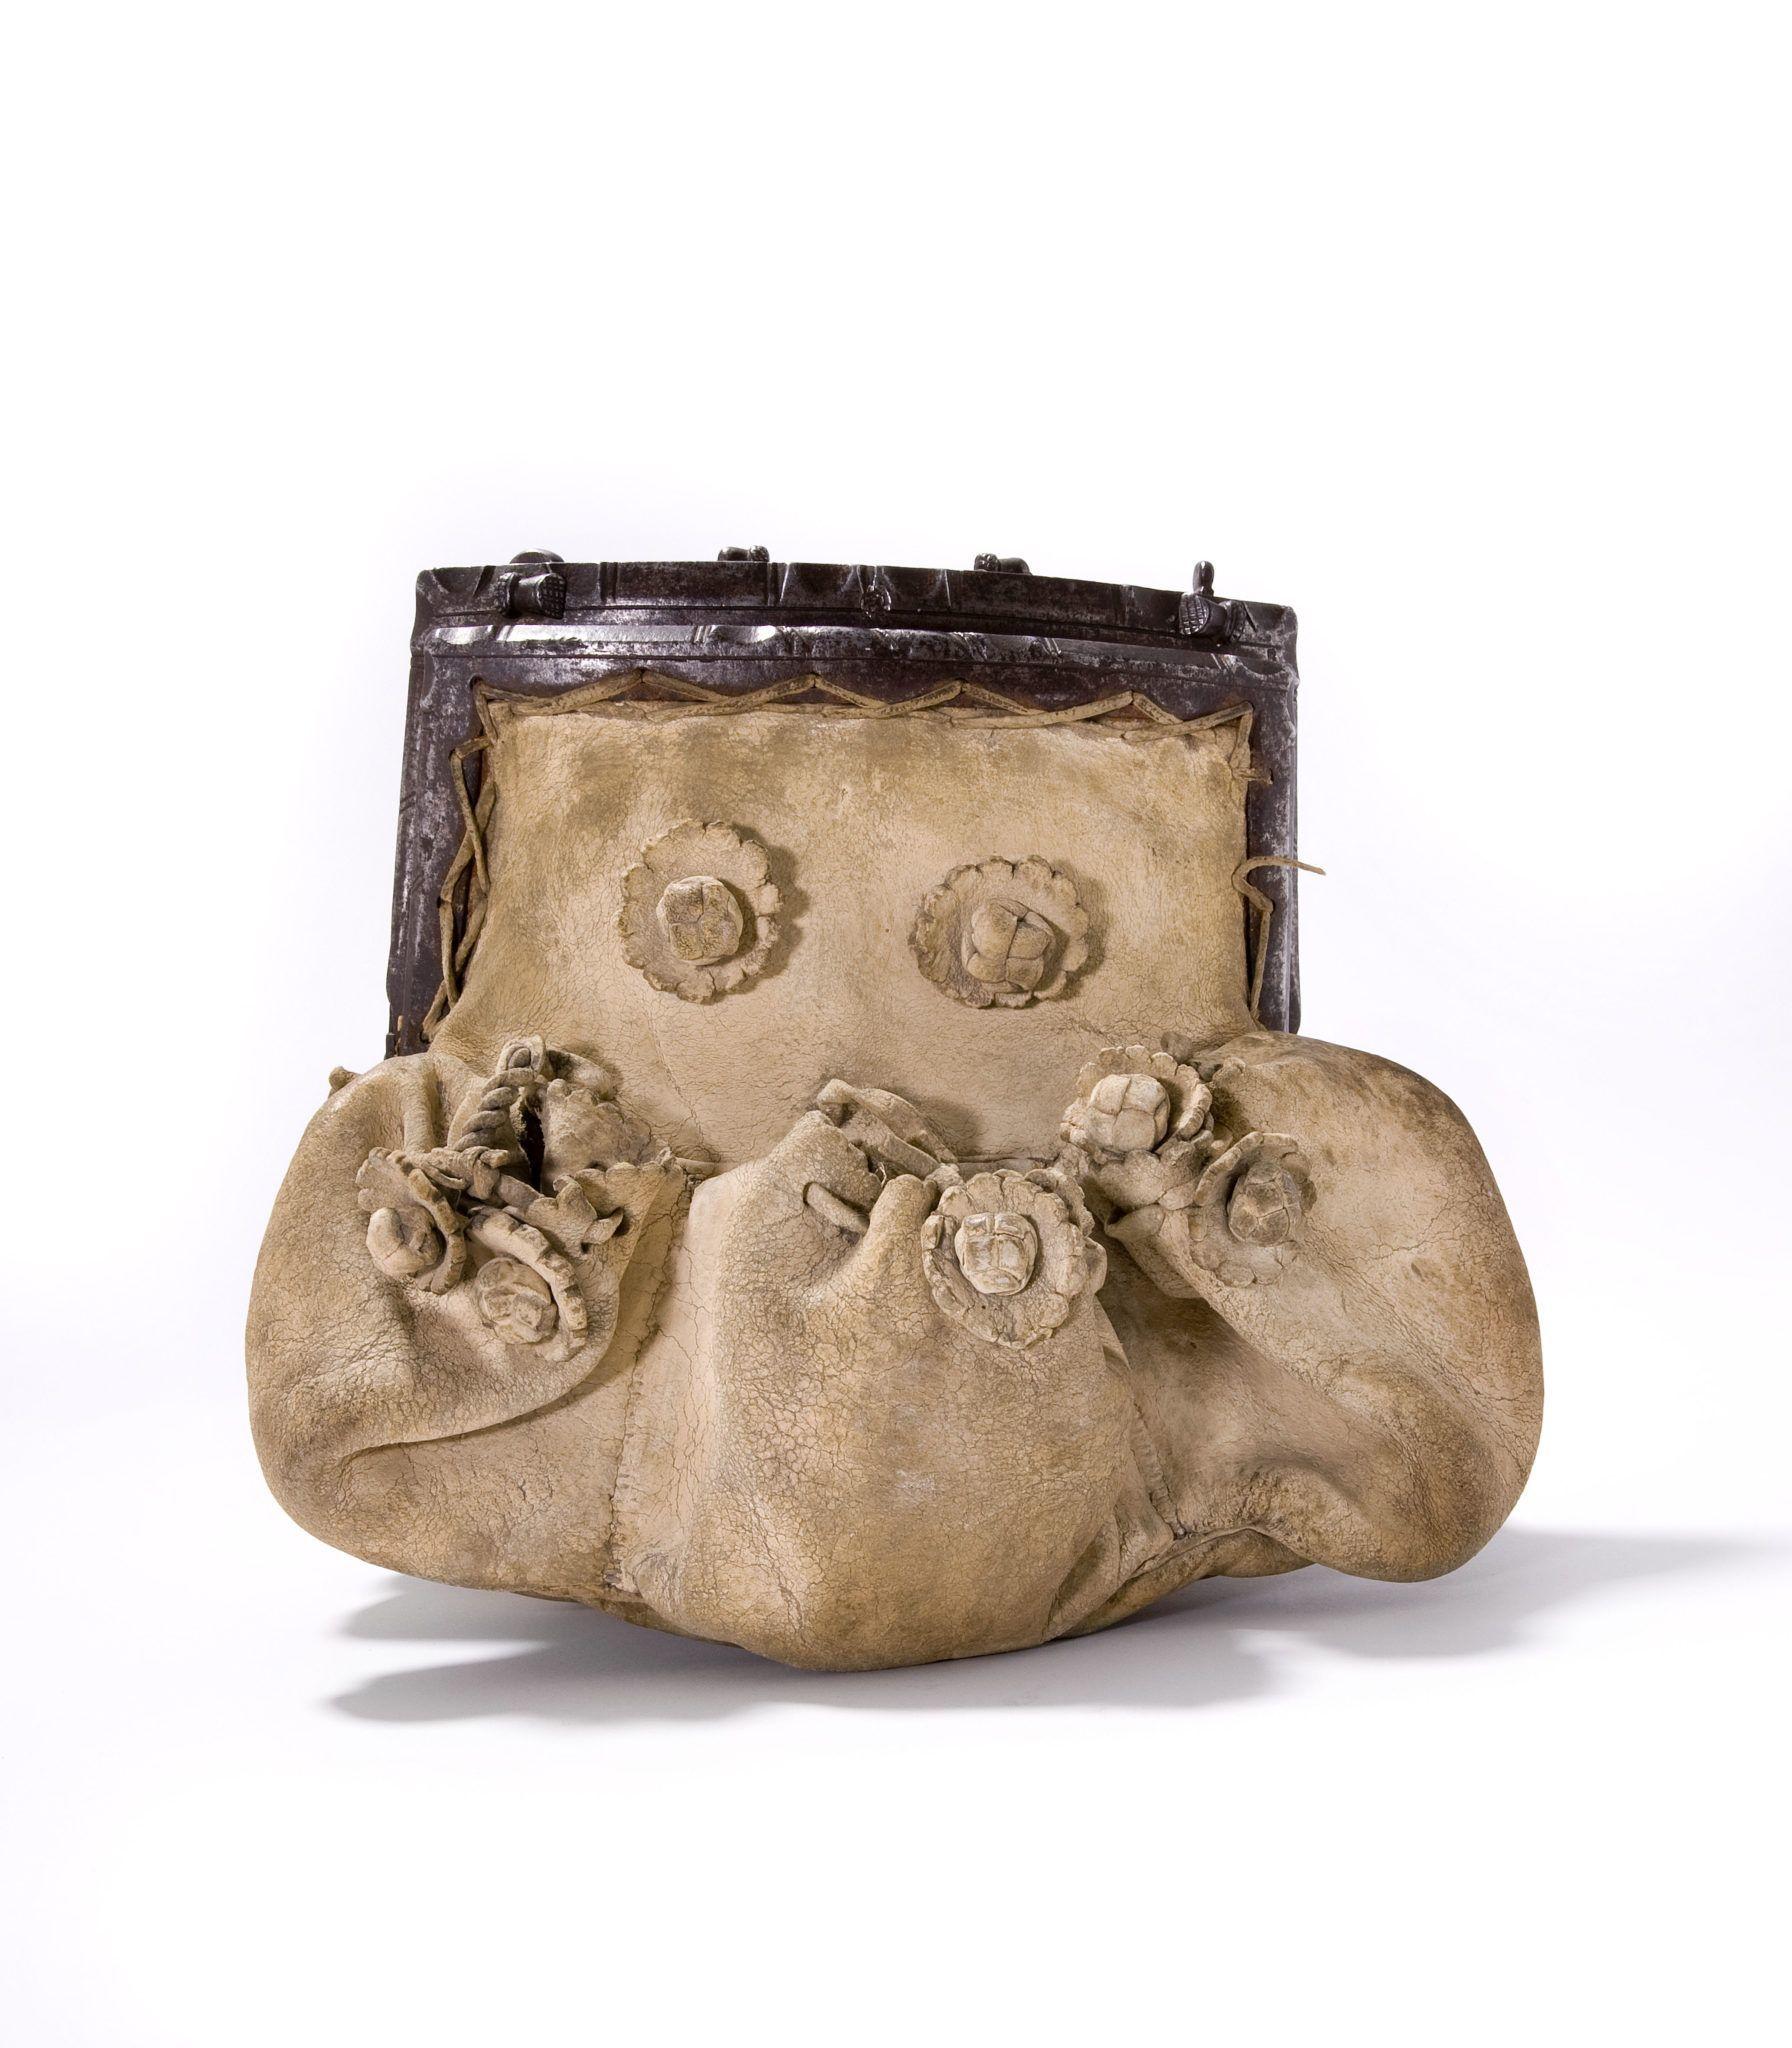 This 16th century men's goatskin bag